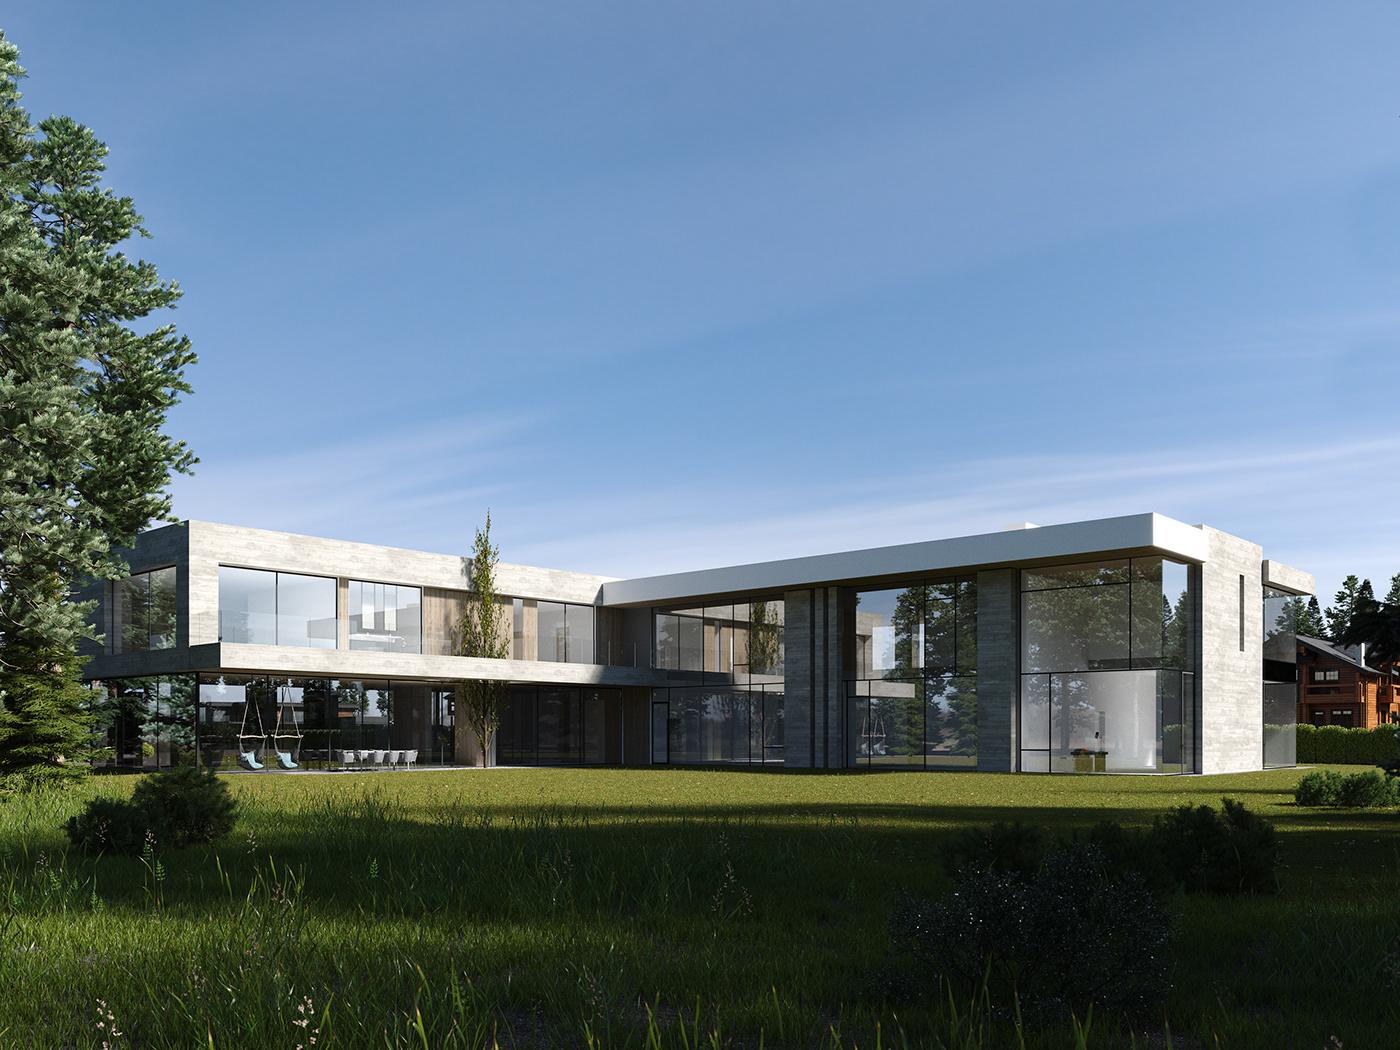 3ds max architecture archviz CGI corona render  design exterior visualization